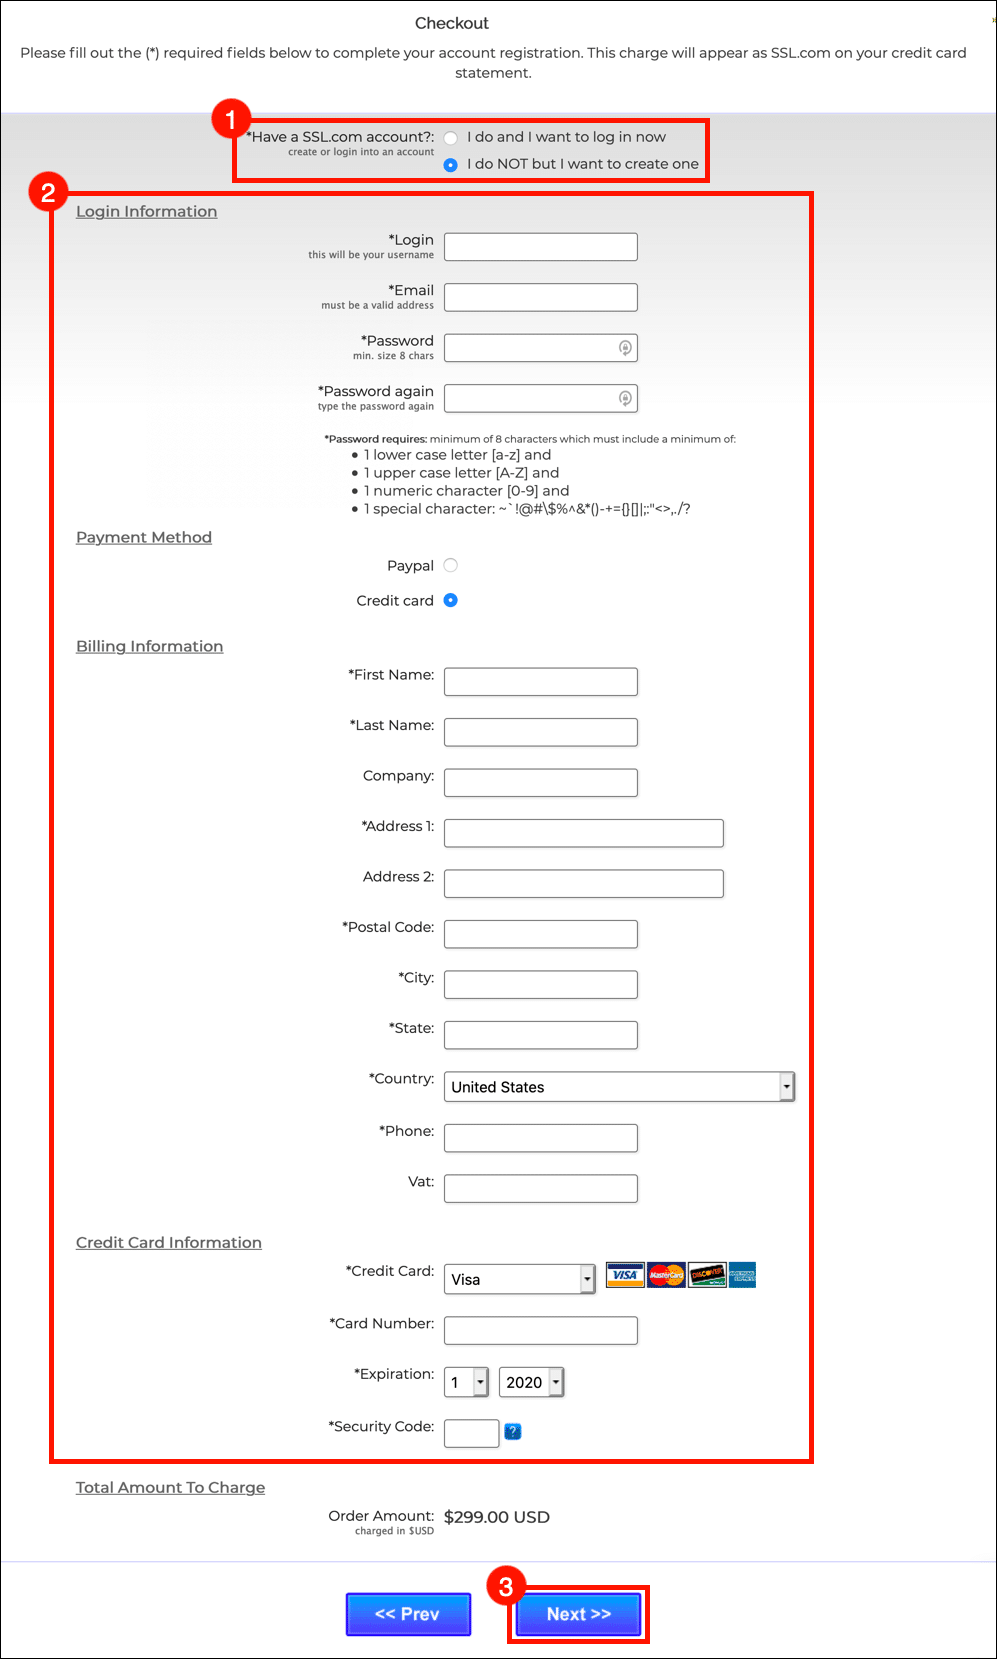 Create SSL.com account